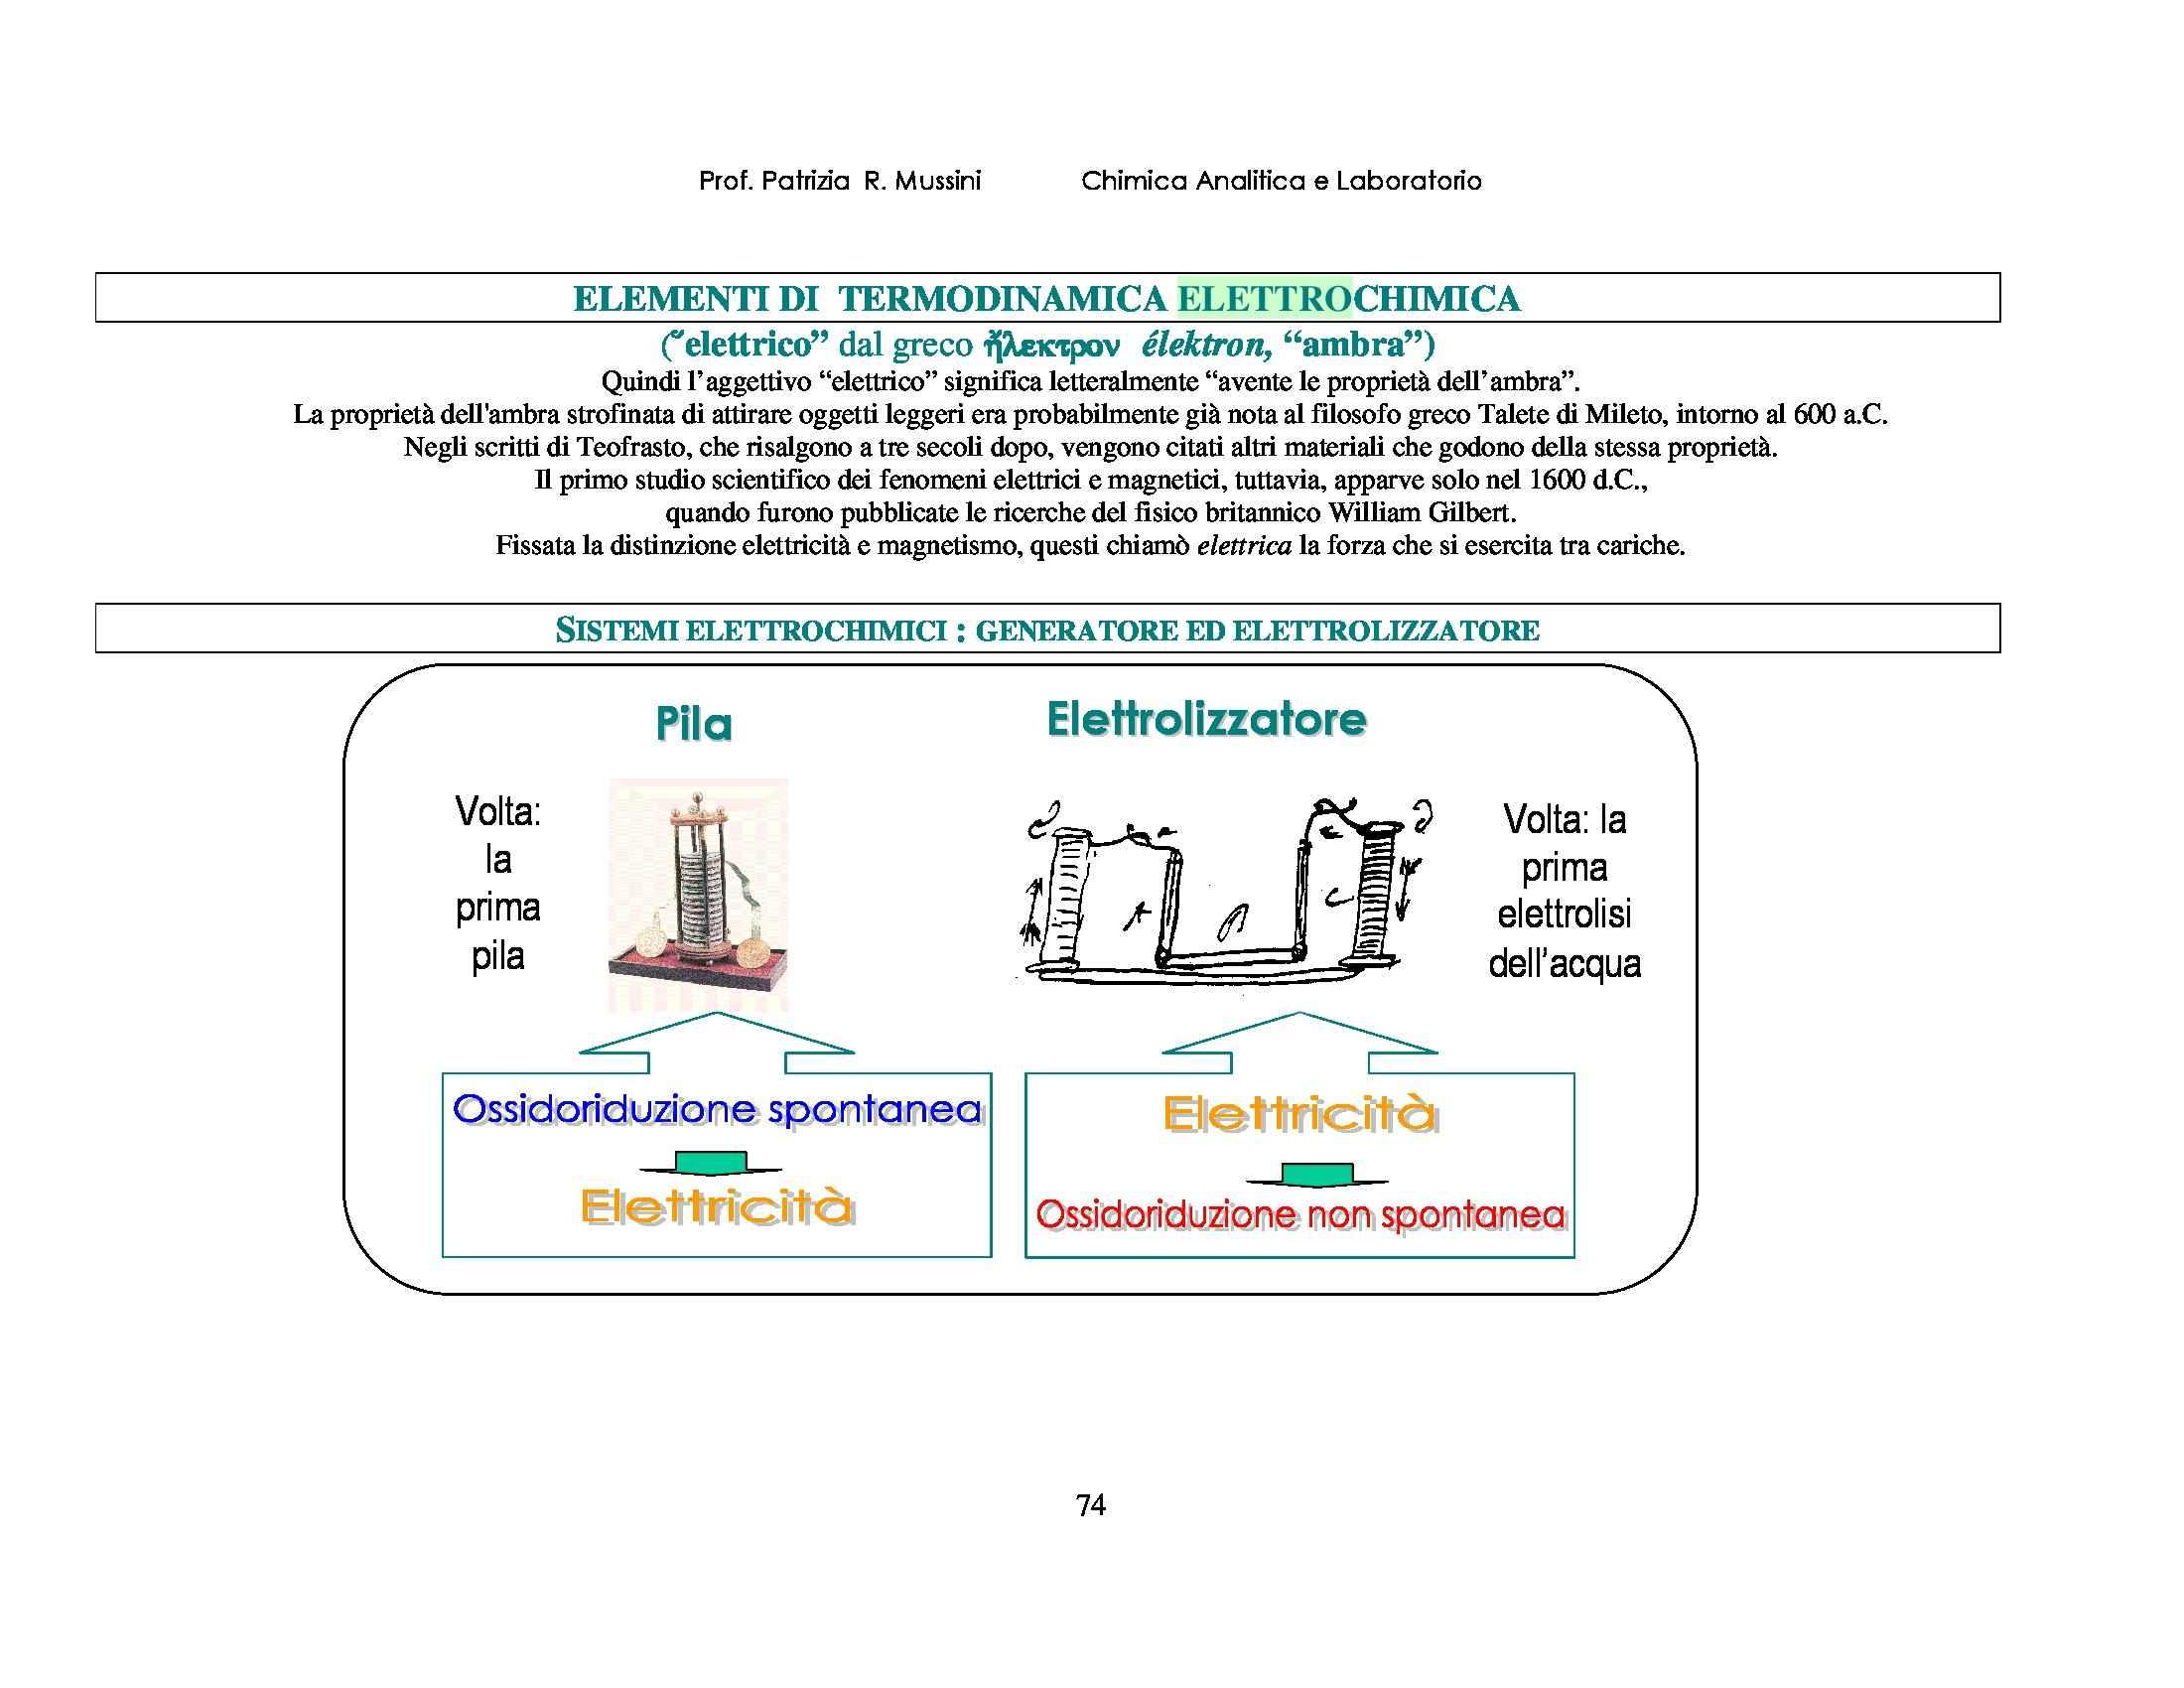 Elementi di termodinamica chimica